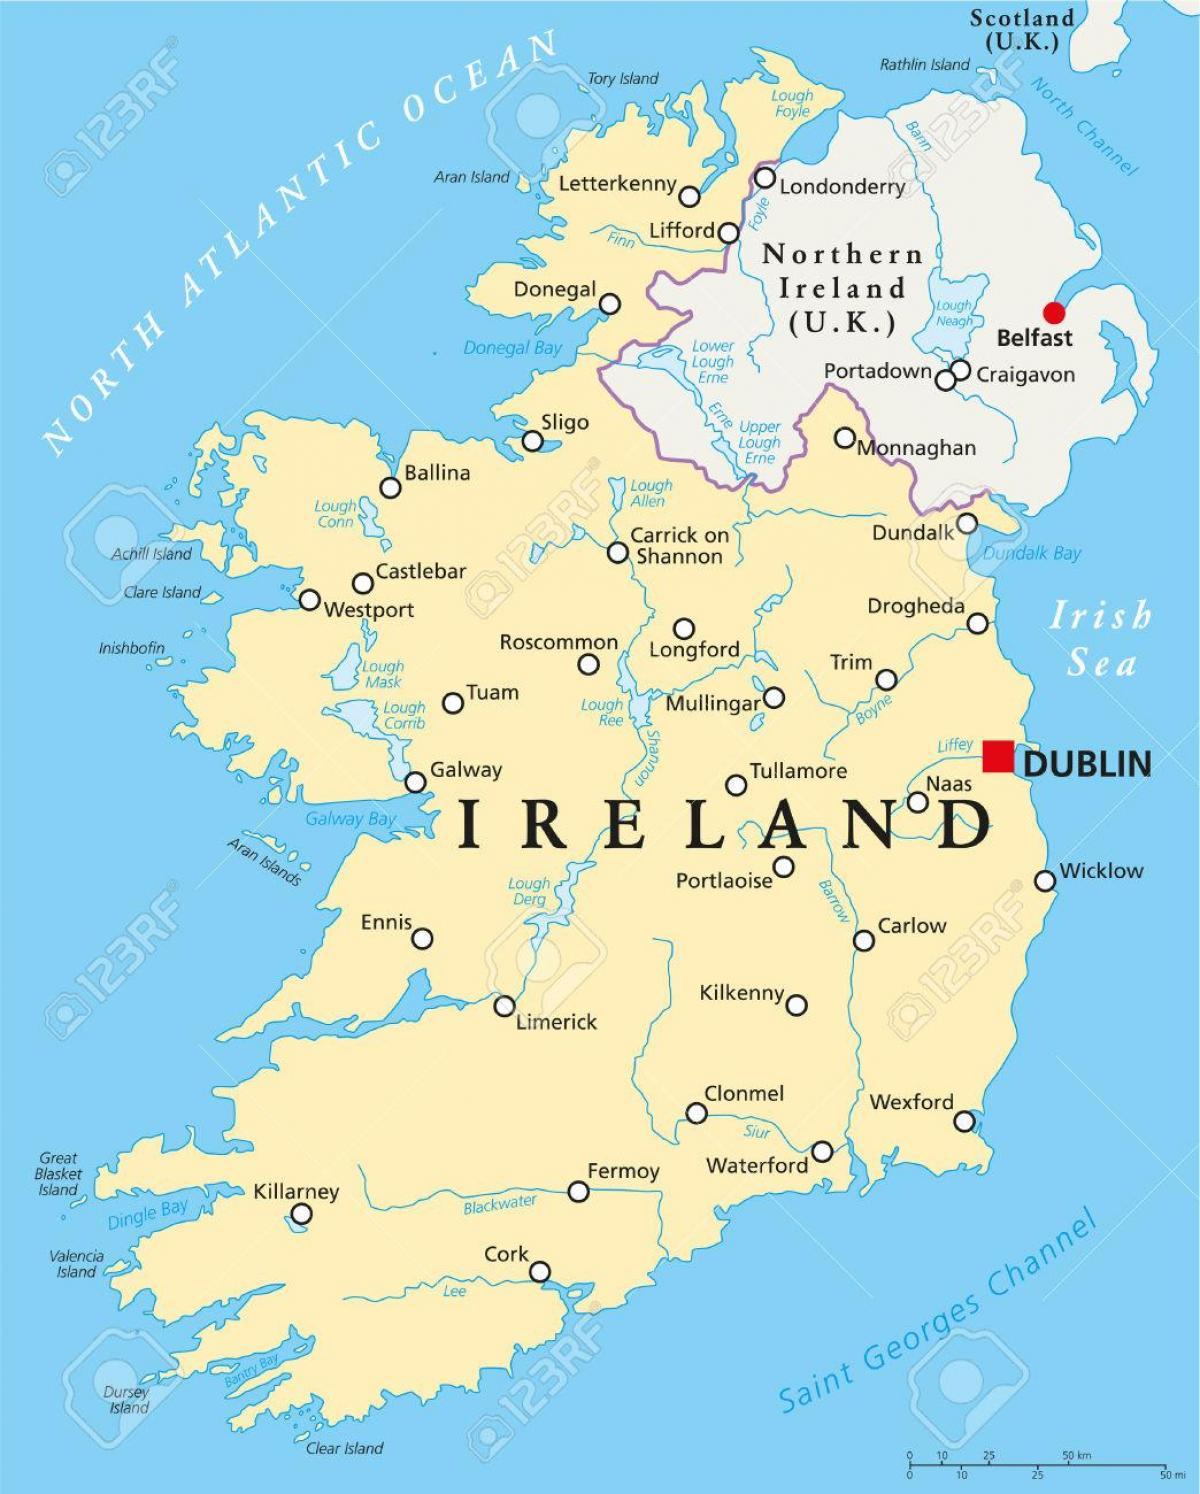 dublin mapa Dublin ireland mapa   Dublin mapa ireland (Ireland) dublin mapa